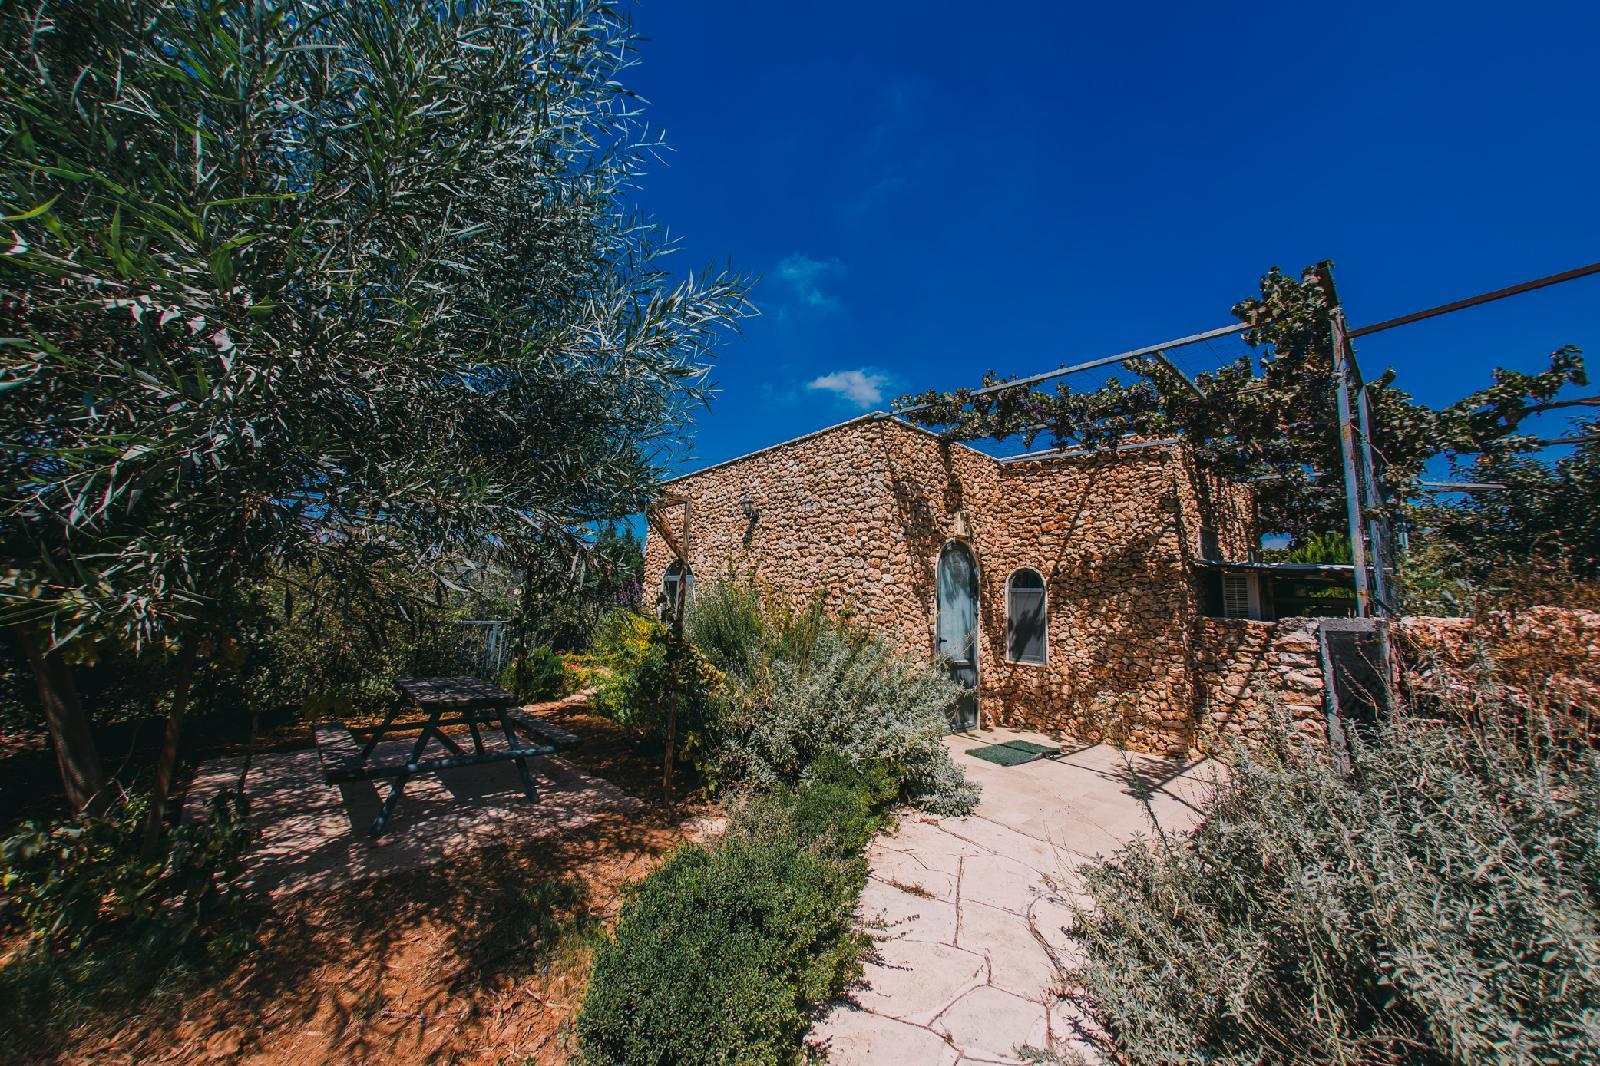 Tur Sinai Organic Farm Resort, Jerusalem Image 2